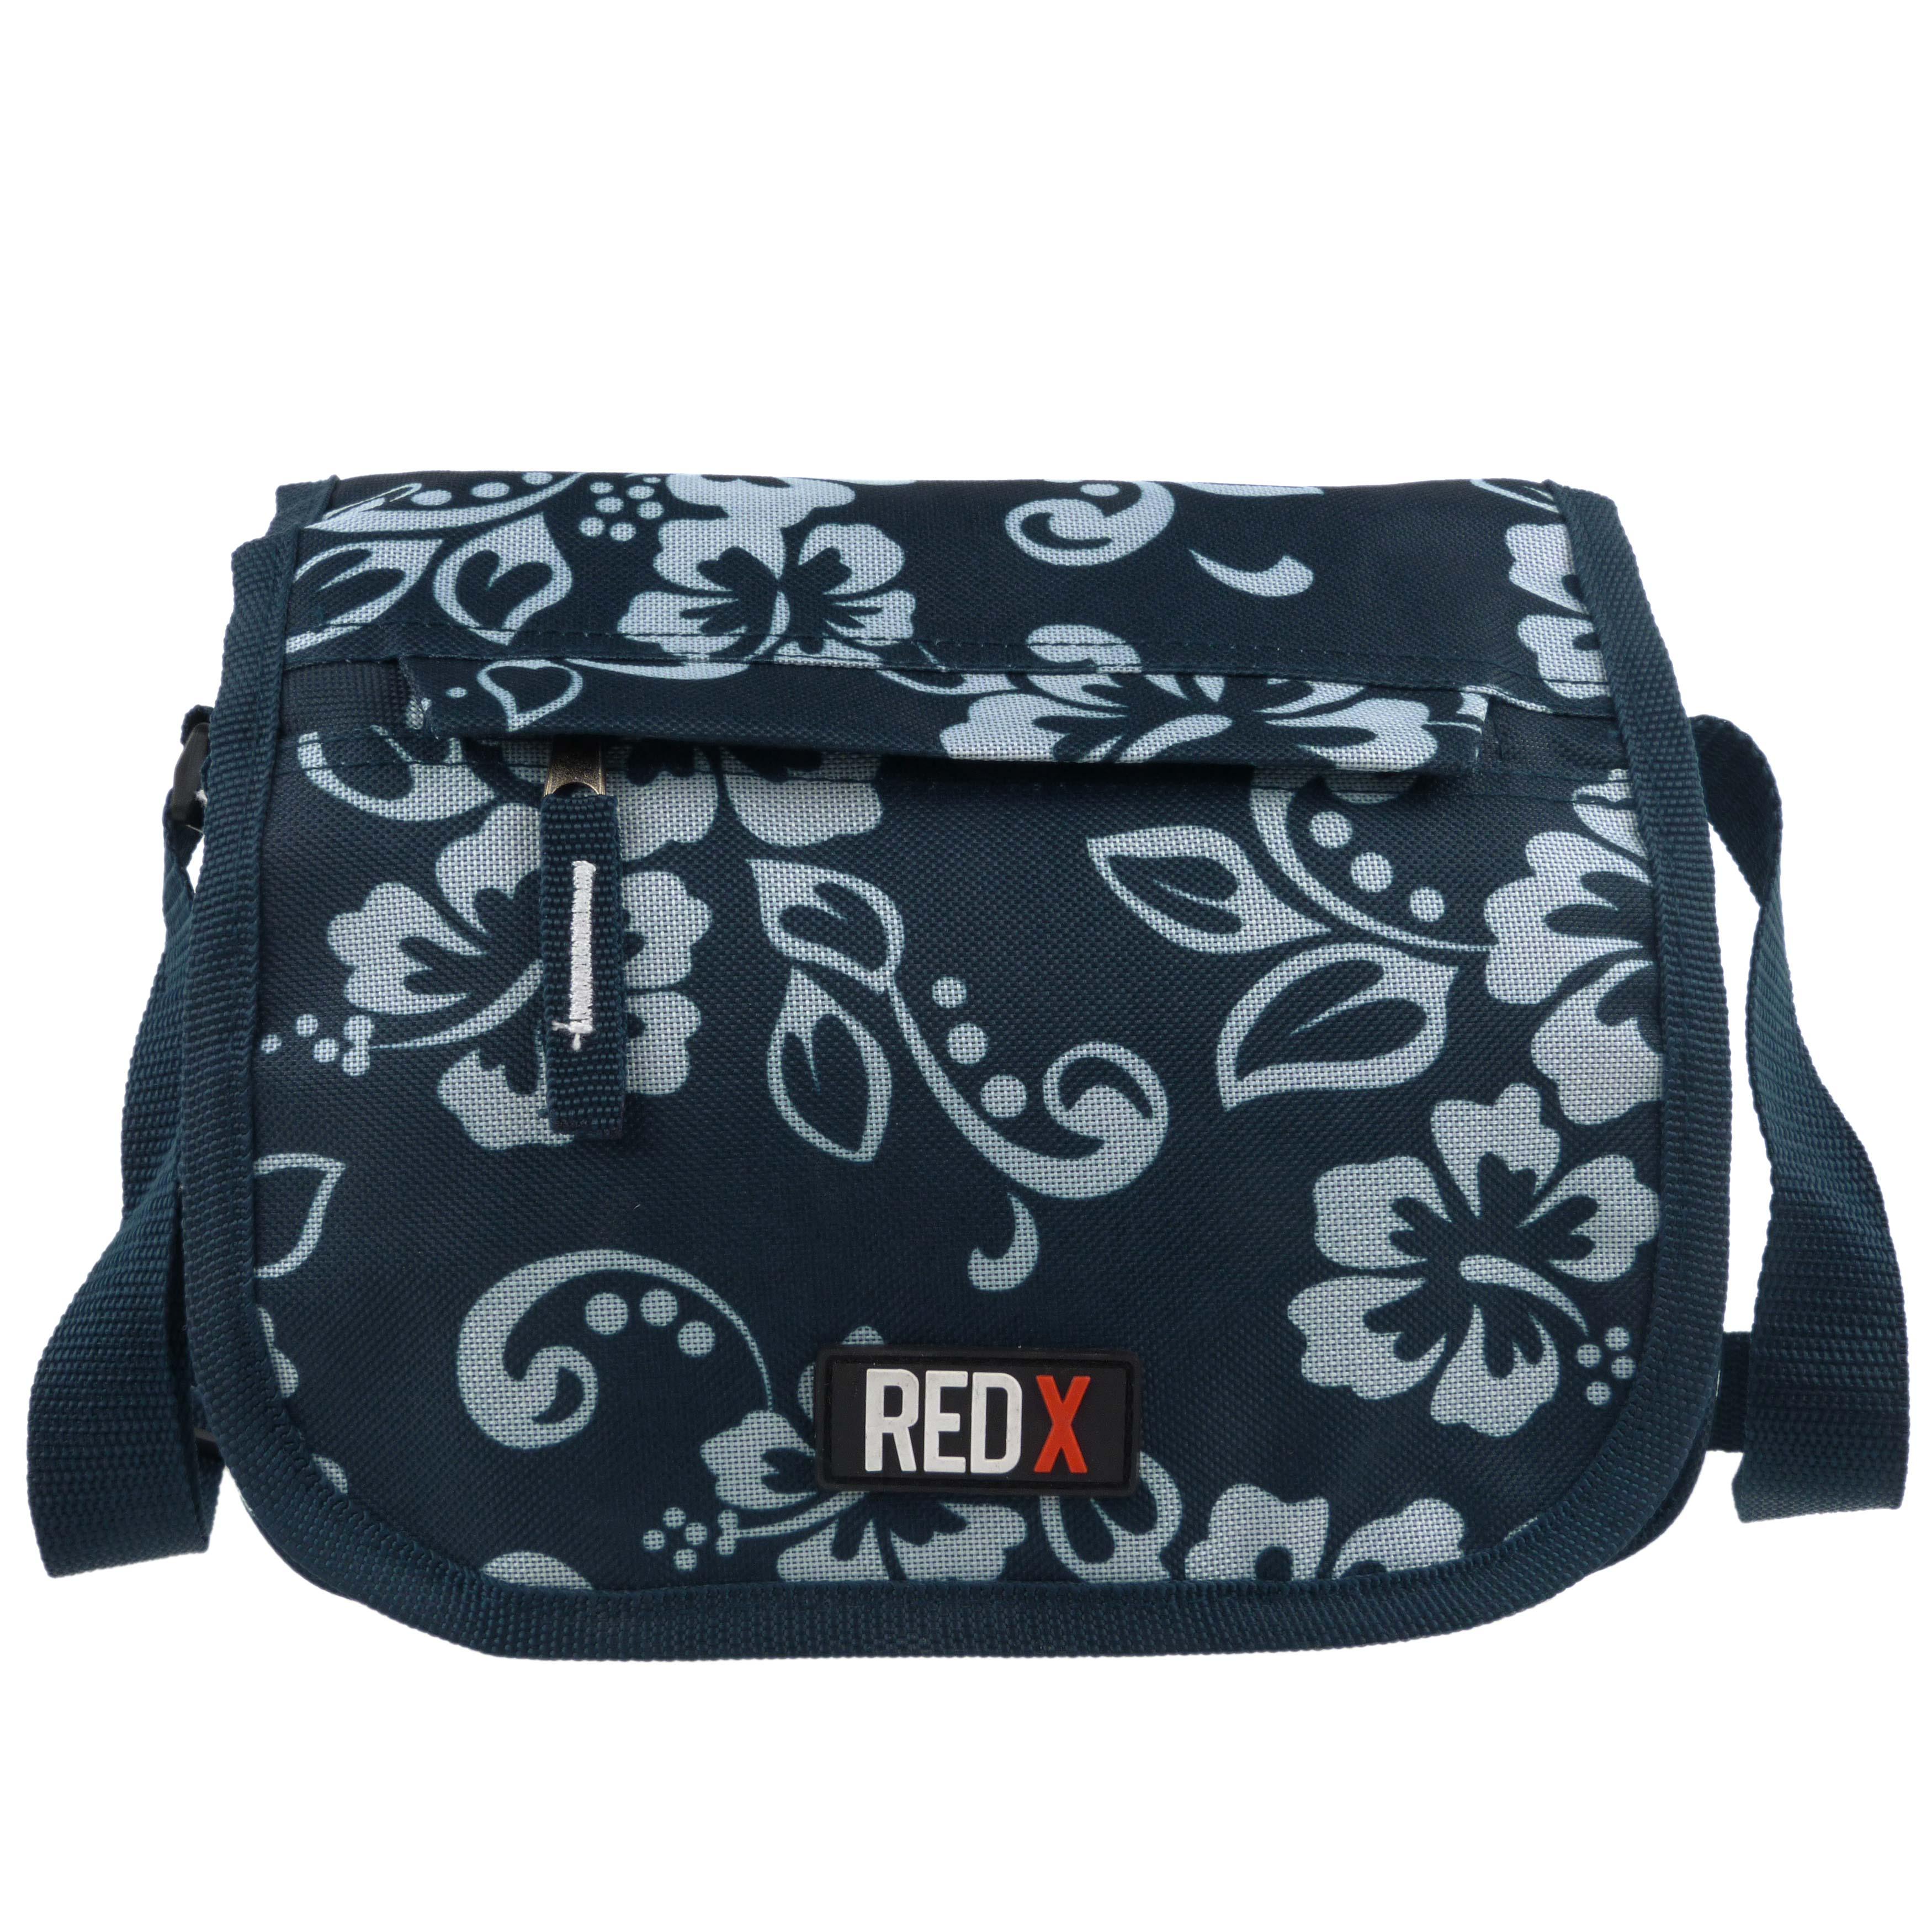 Ladies-Girls-Medium-Hibiscus-Shoulder-Travel-Cross-Body-Bag-by-RED-X-Floral thumbnail 3